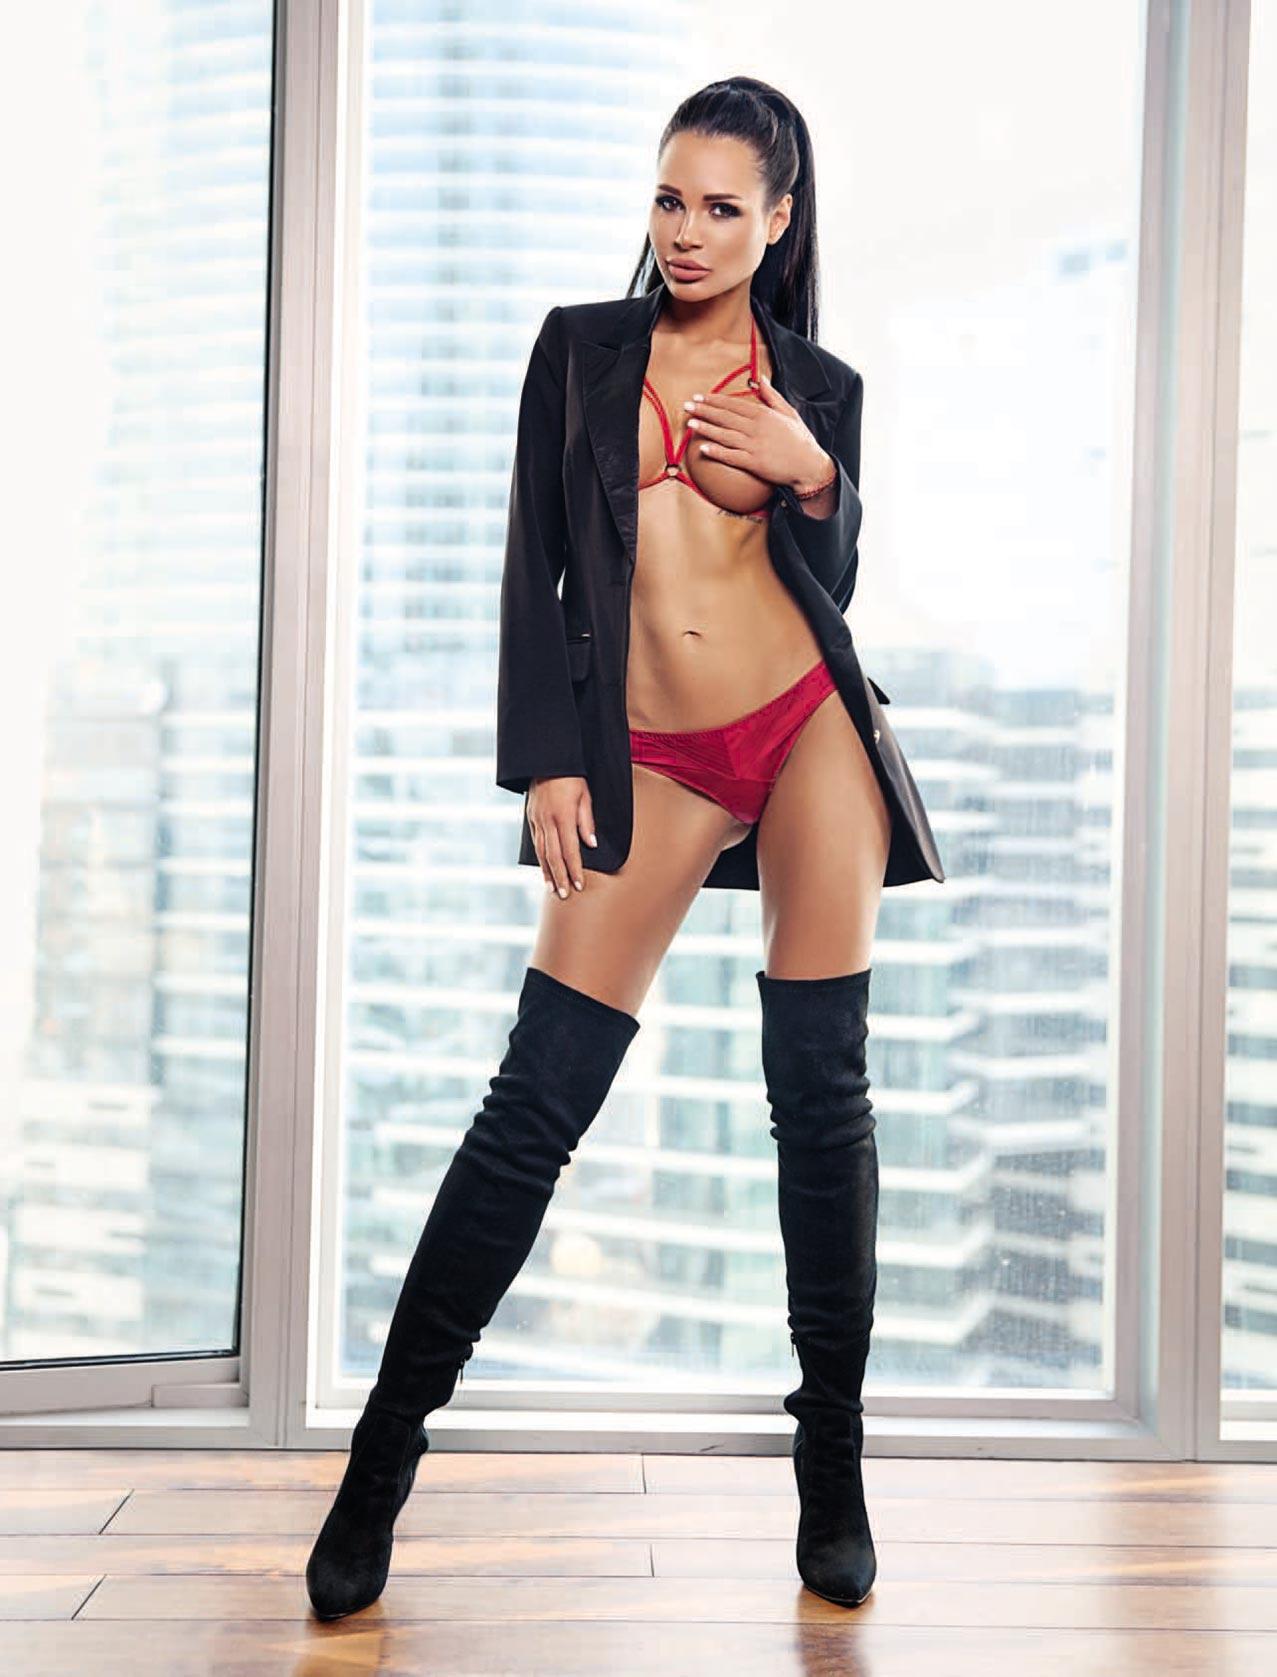 Девушка месяца / Милана Миловская, фотограф Таша Манаенкова / Playboy Украина май-июнь 2018